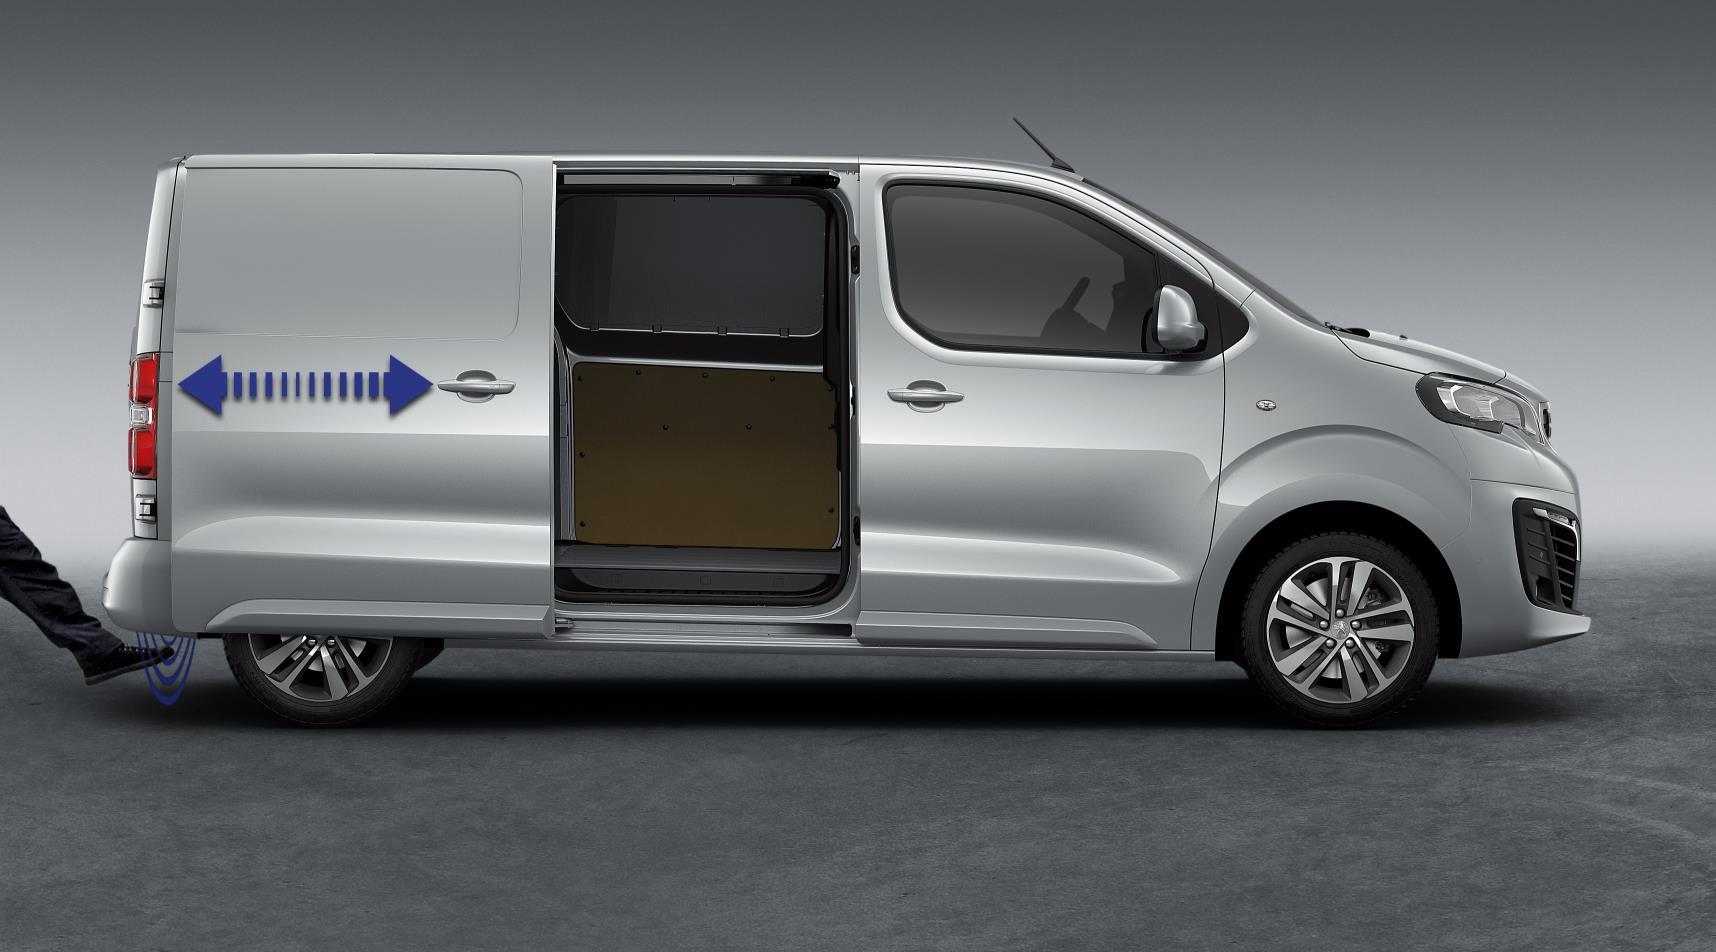 2016 peugeot expert promises class leading fuel economy. Black Bedroom Furniture Sets. Home Design Ideas